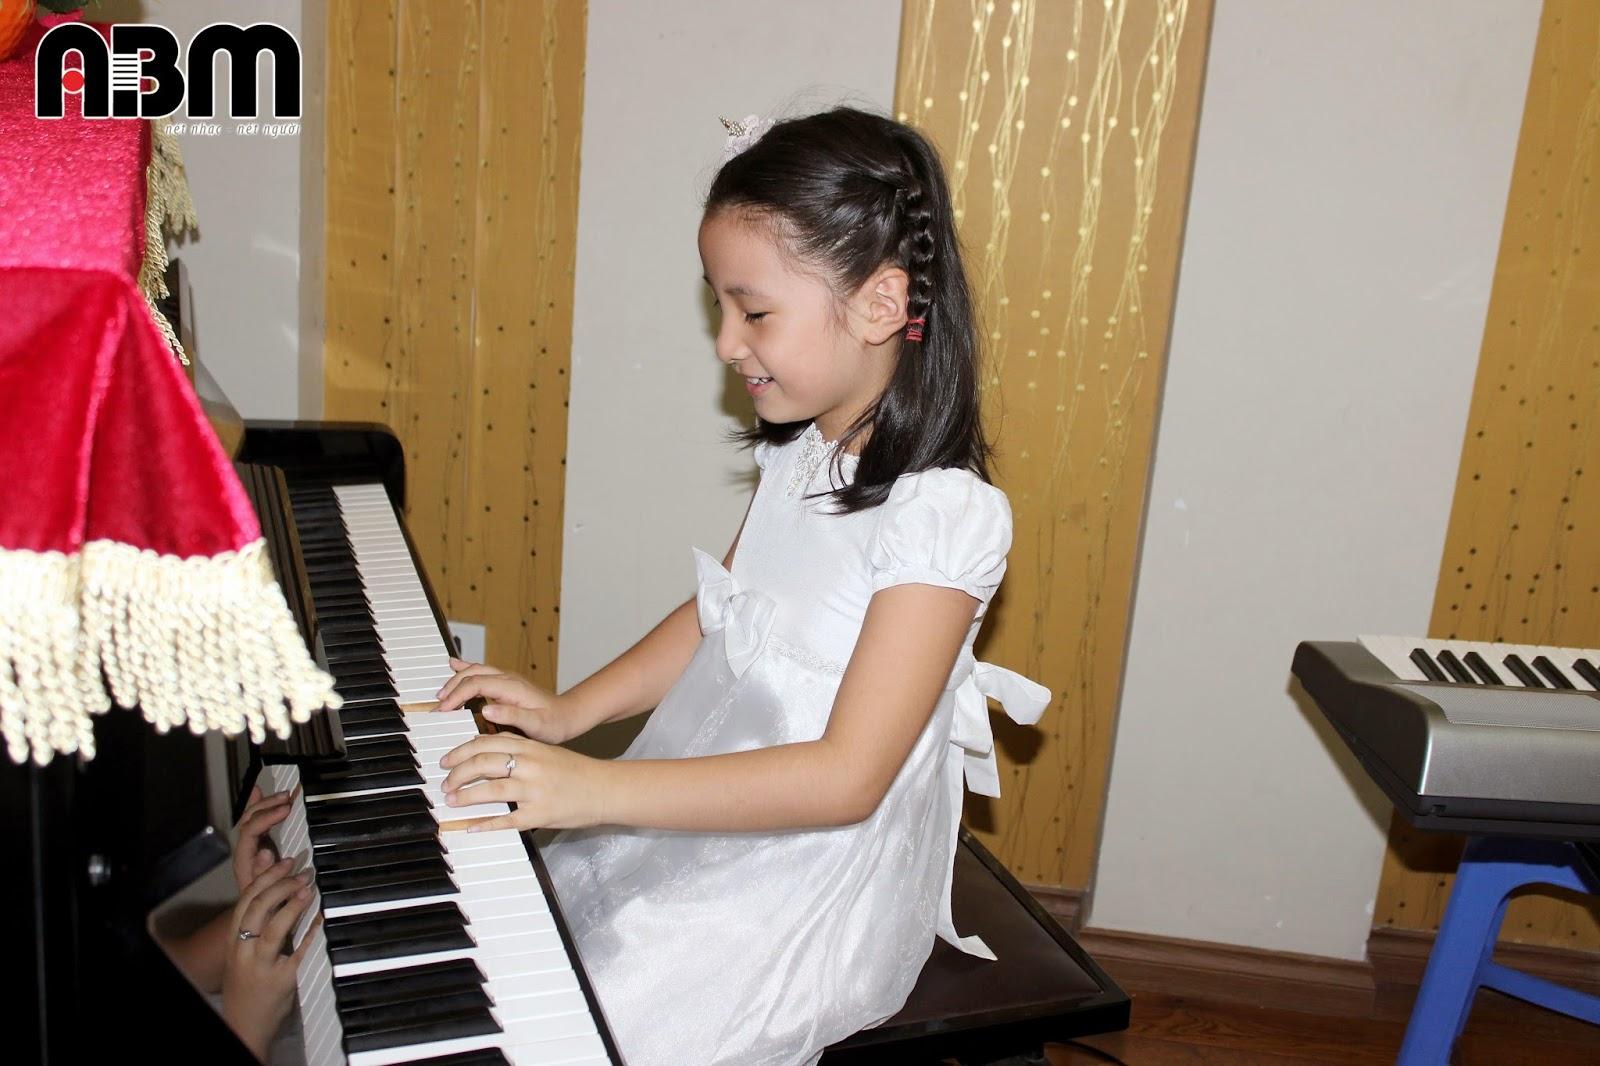 h%E1%BB%8Dc%2Borgan%2Bt%E1%BA%A1i%2Bh%C3%A0%2Bn%E1%BB%99i%2B(4) Khóa học Piano tại ABM Music